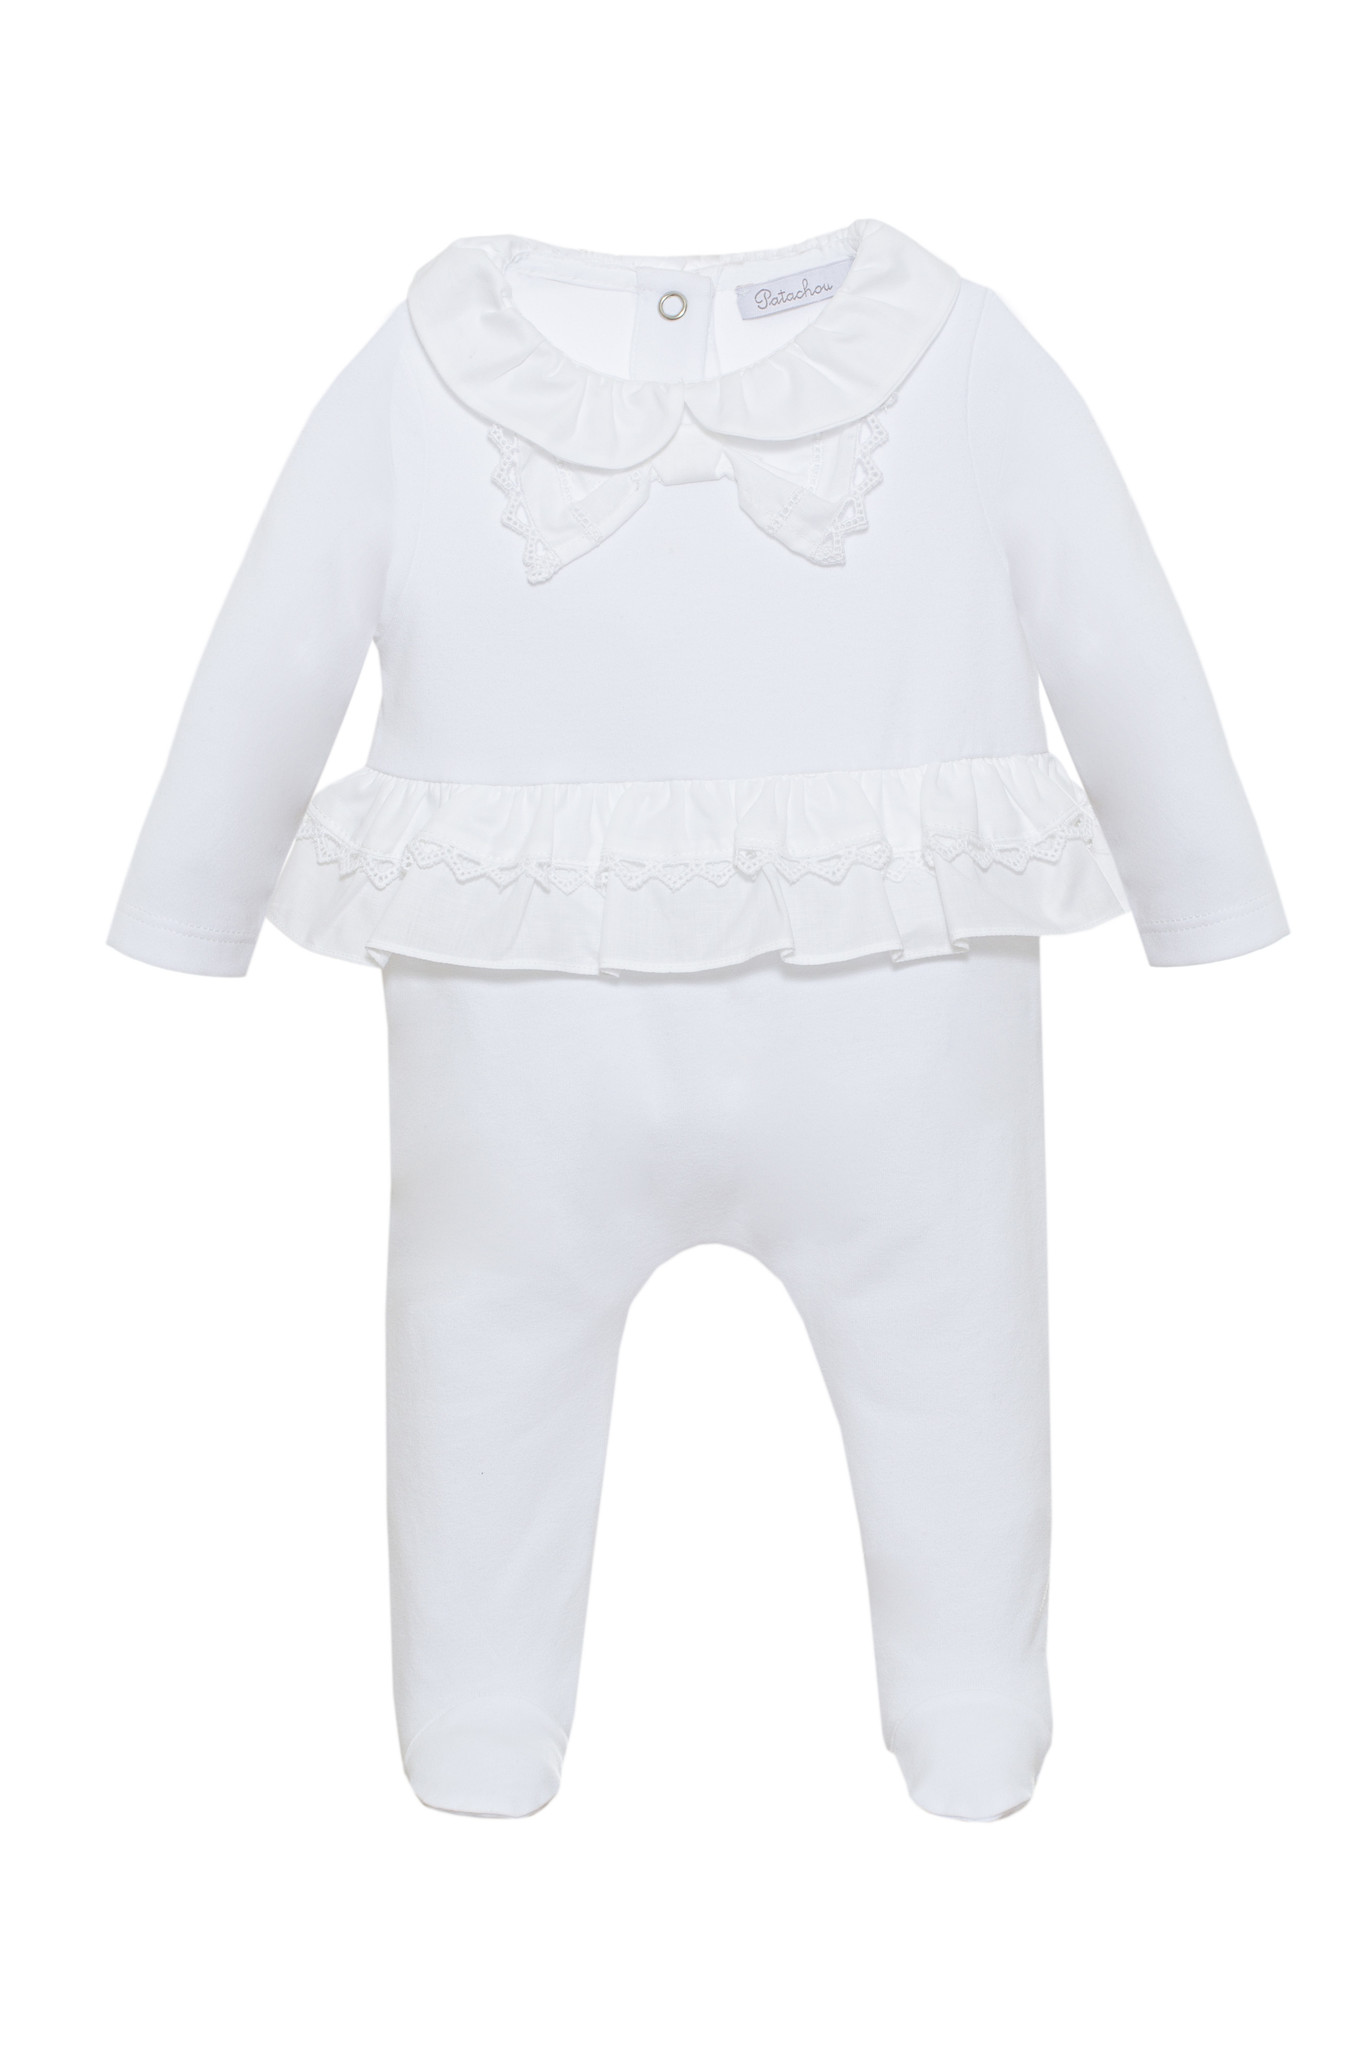 Patachou Baby Girl Knit Playsuit 3014 S21